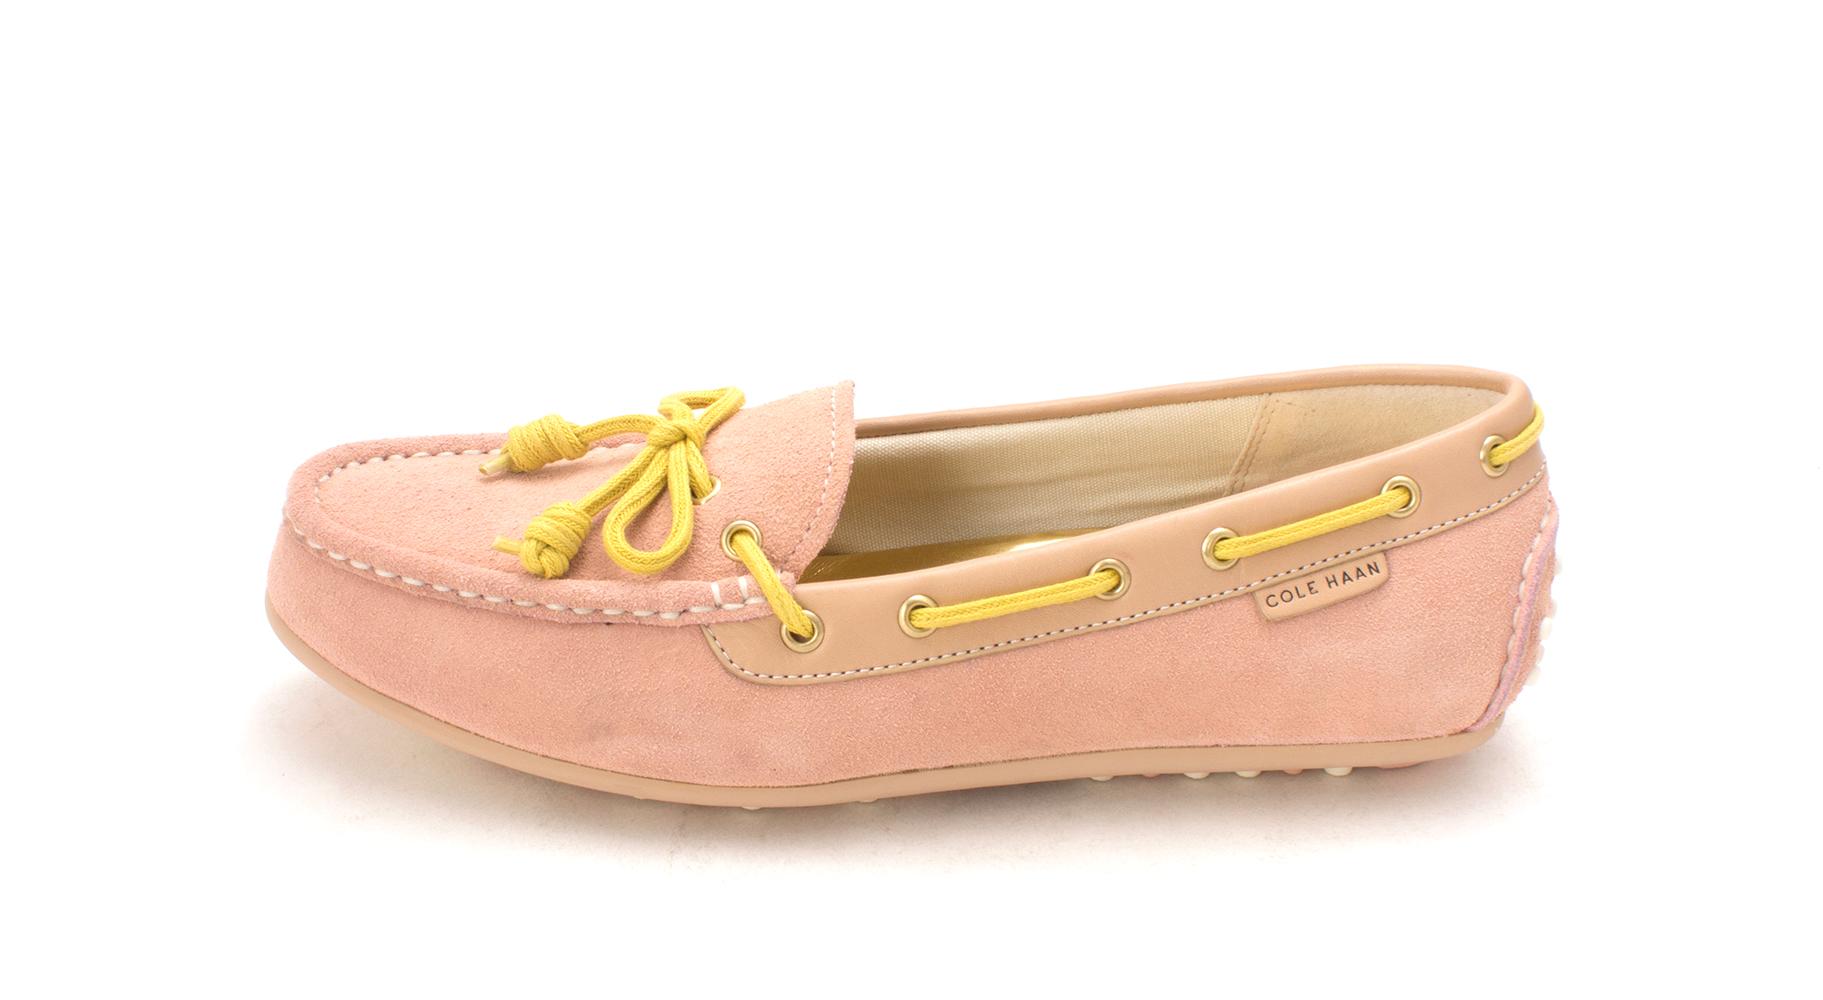 Cole Haan Donna Electasam Closed Toe Boat Scarpe, Rosa/Yellow, Taglia 6.0